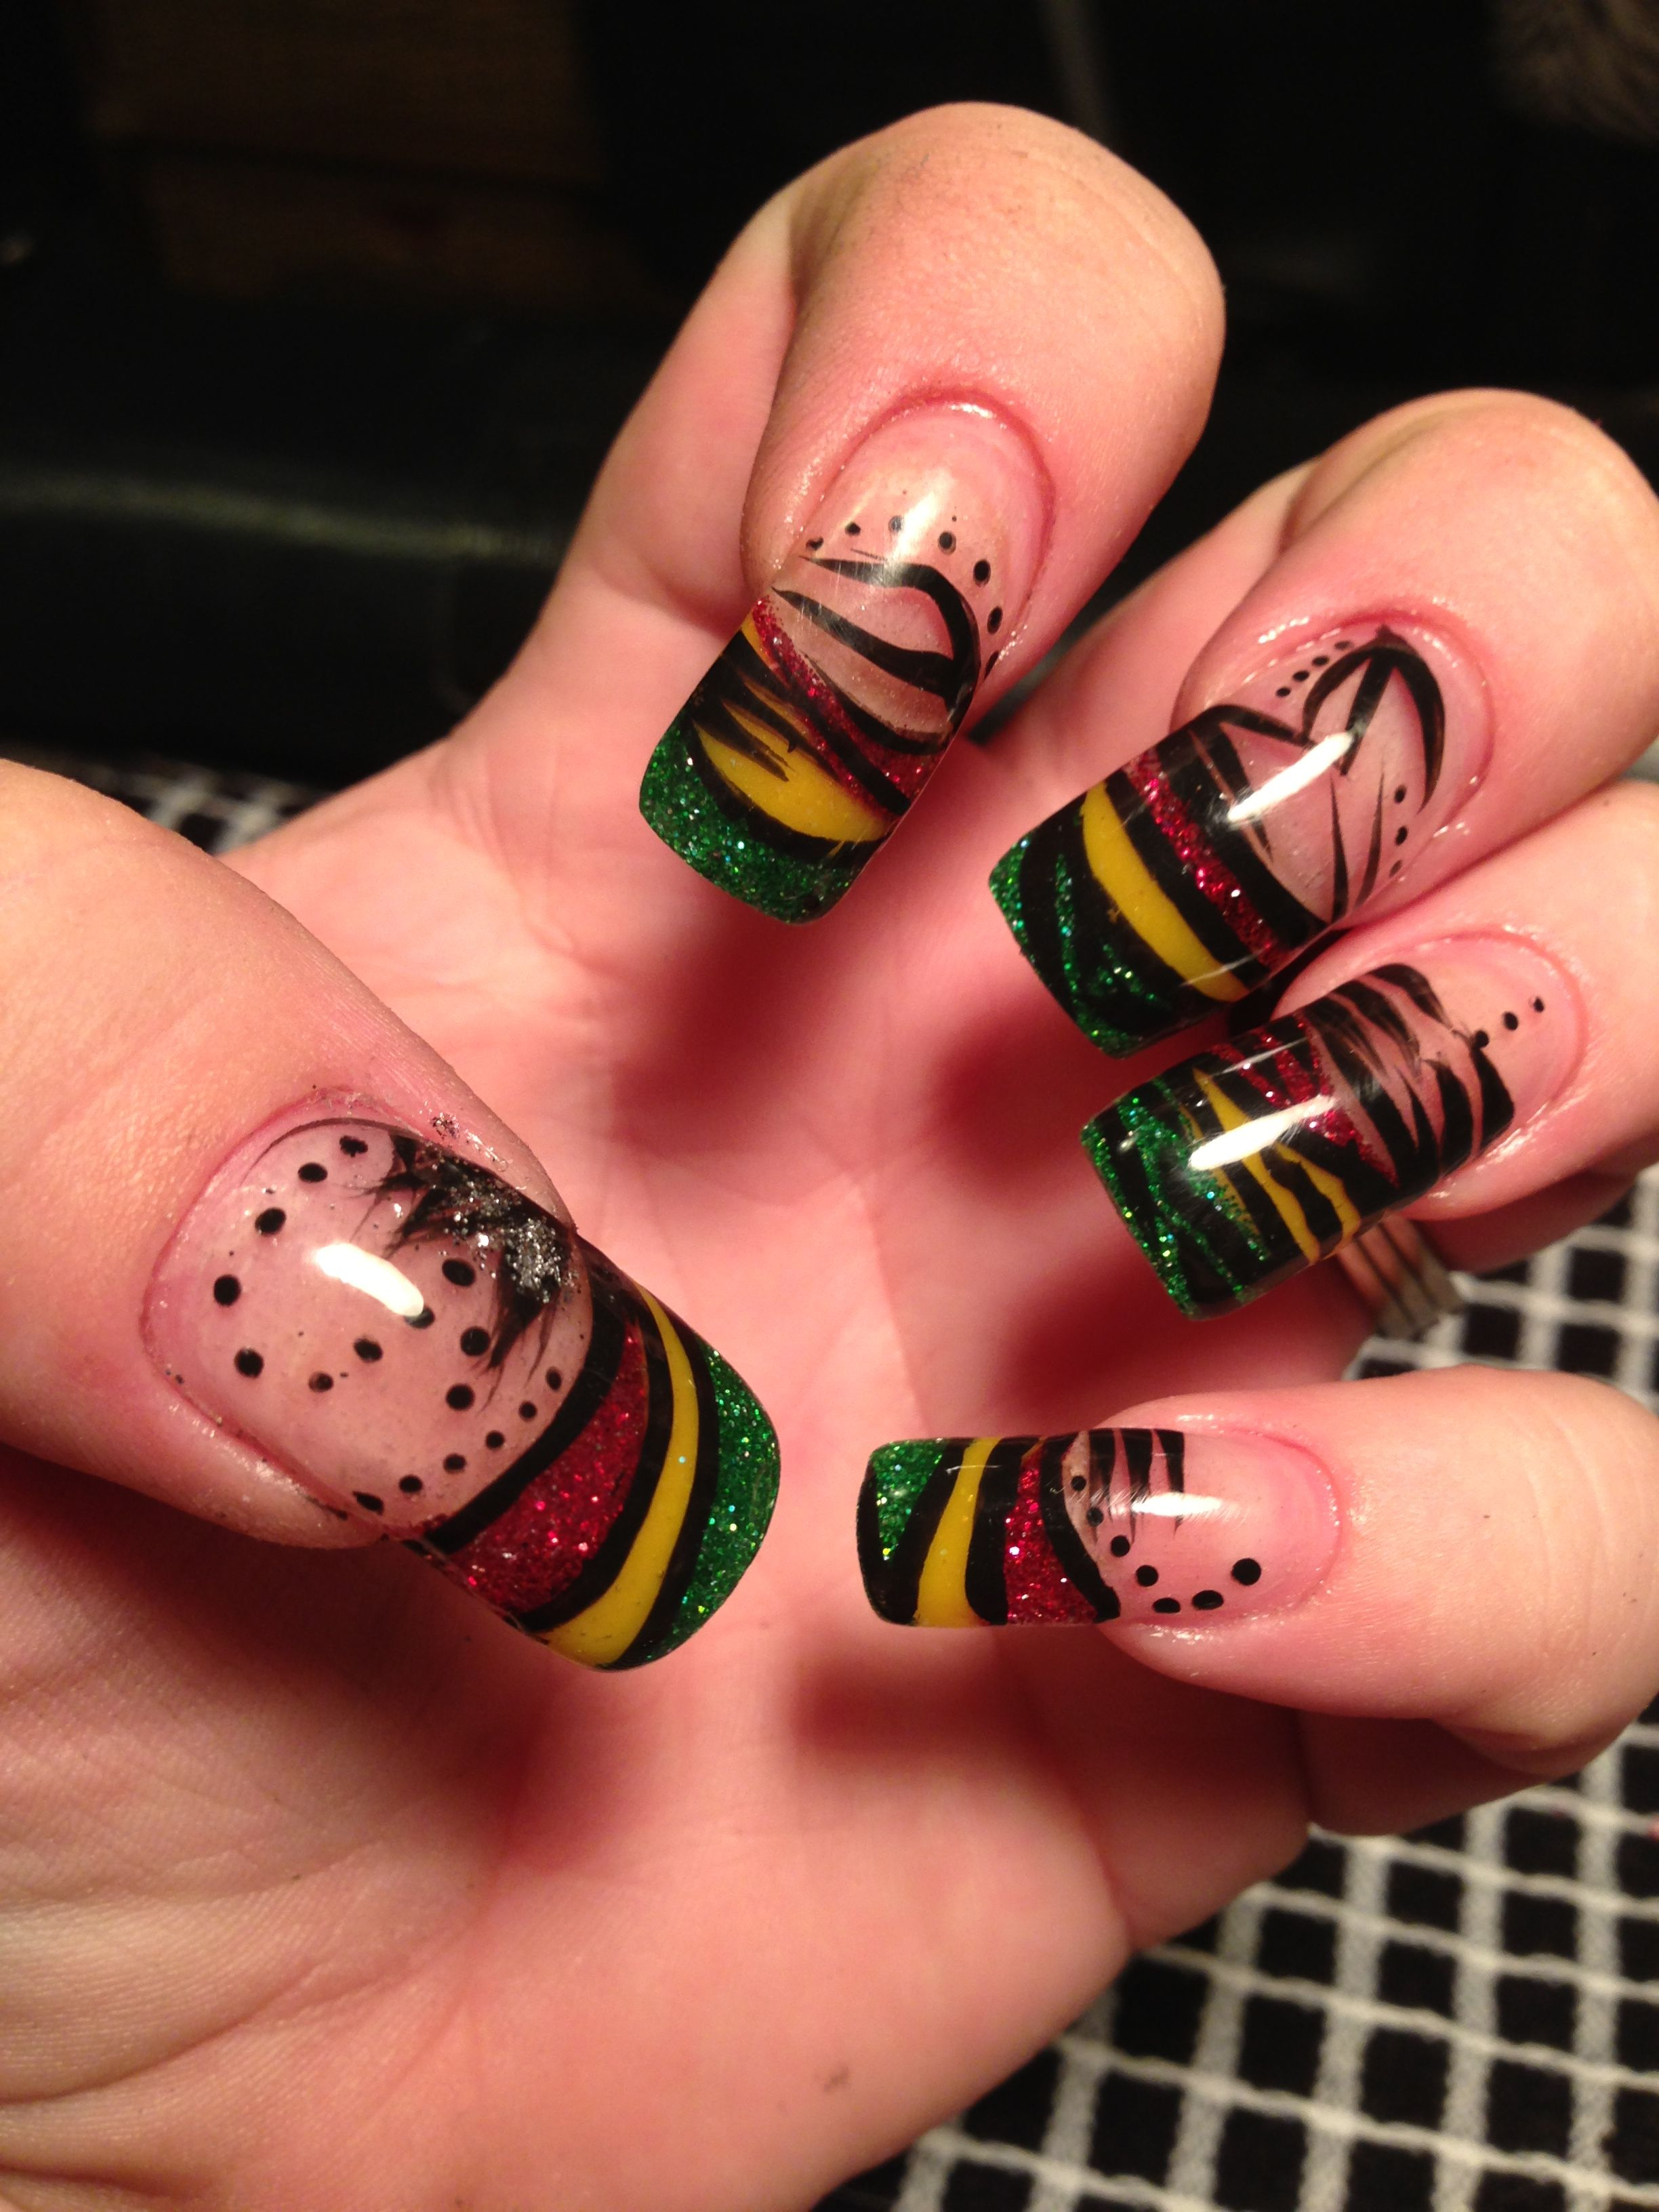 My Rasta Nails with hand painted nail art design | Nails ...